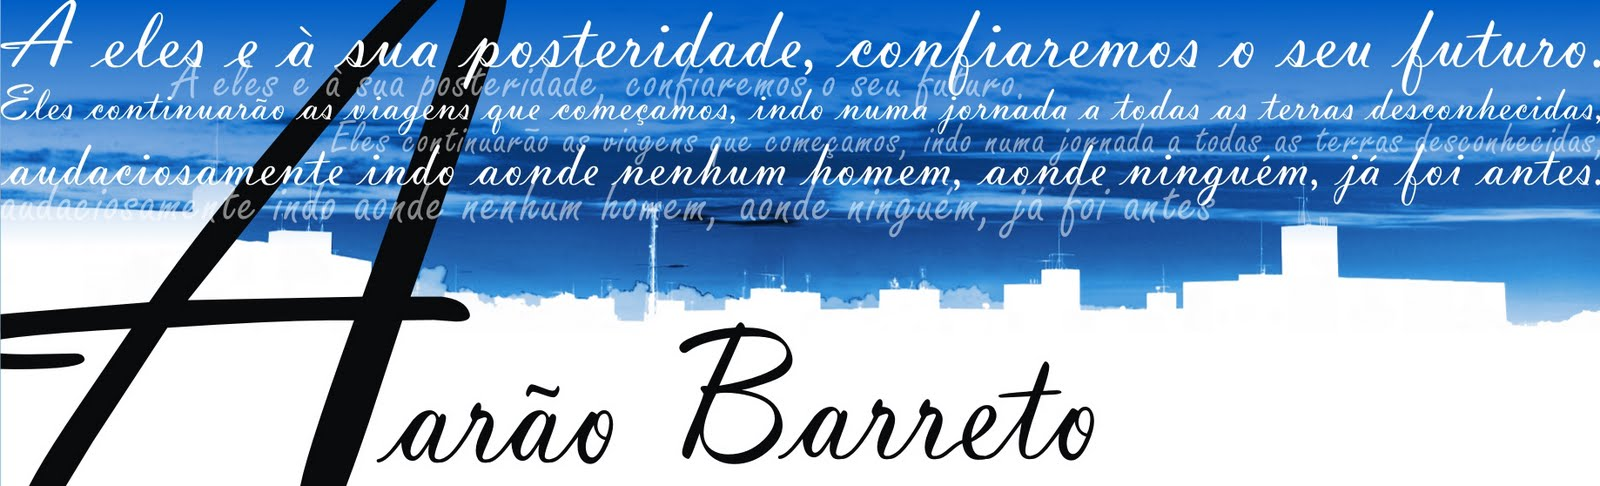 Aarão Barreto